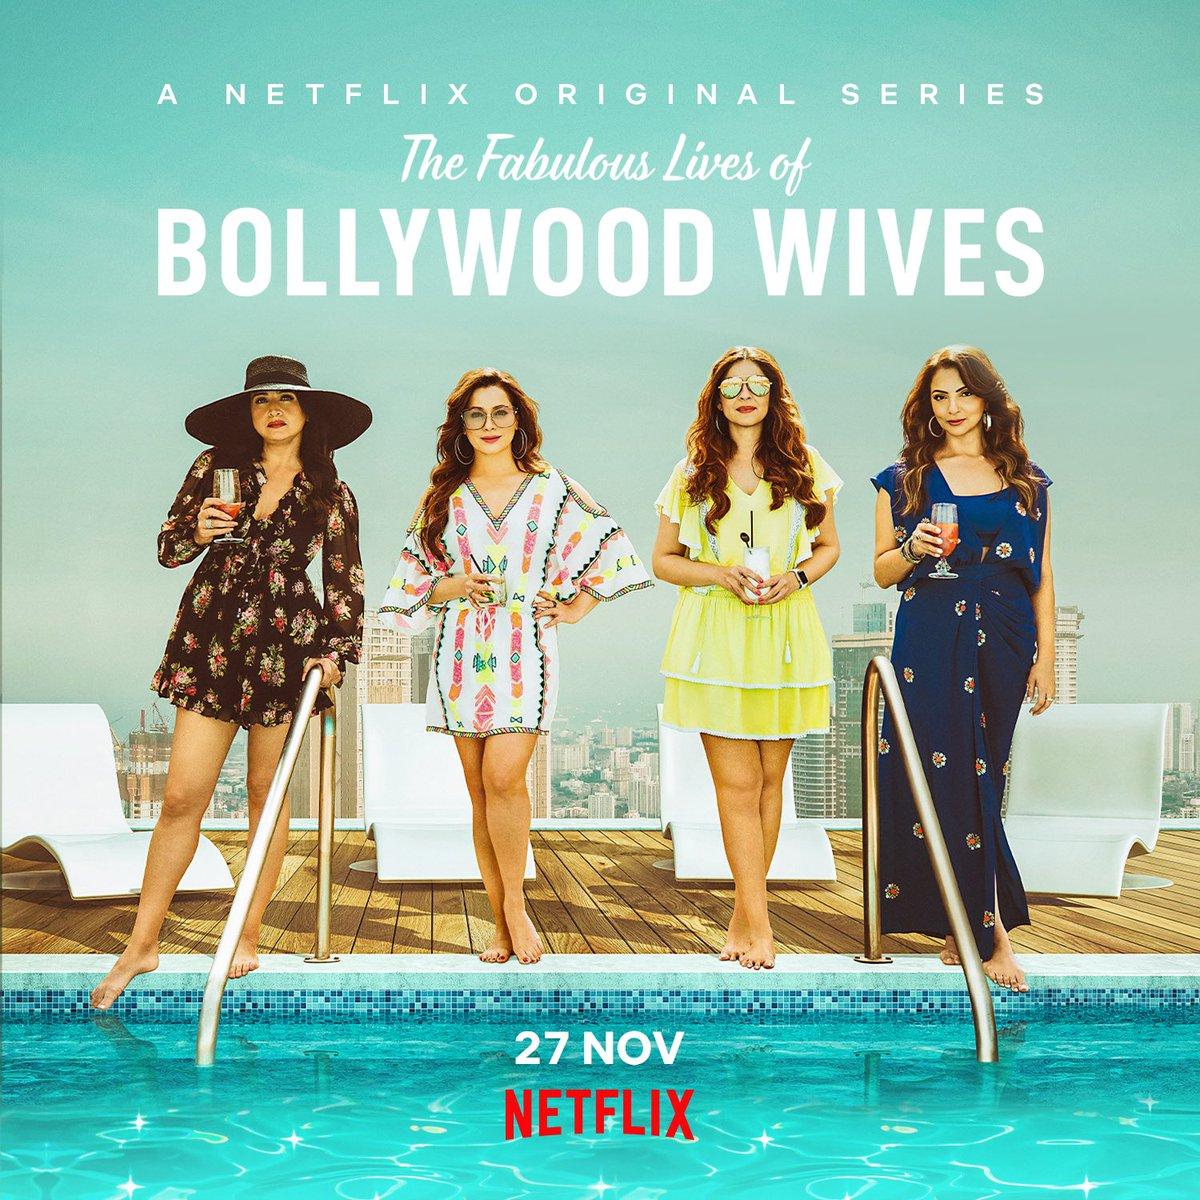 Make way for these four ladies and make room for some fabulous entertainment! #FabulousLives premieres tomorrow on #Netflix.  @maheepkapoor @neelamkothari @seemakkhan @BhavanaPandey @NetflixIndia @apoorvamehta18 @aneeshabaig @scrappypants #UttamDomale